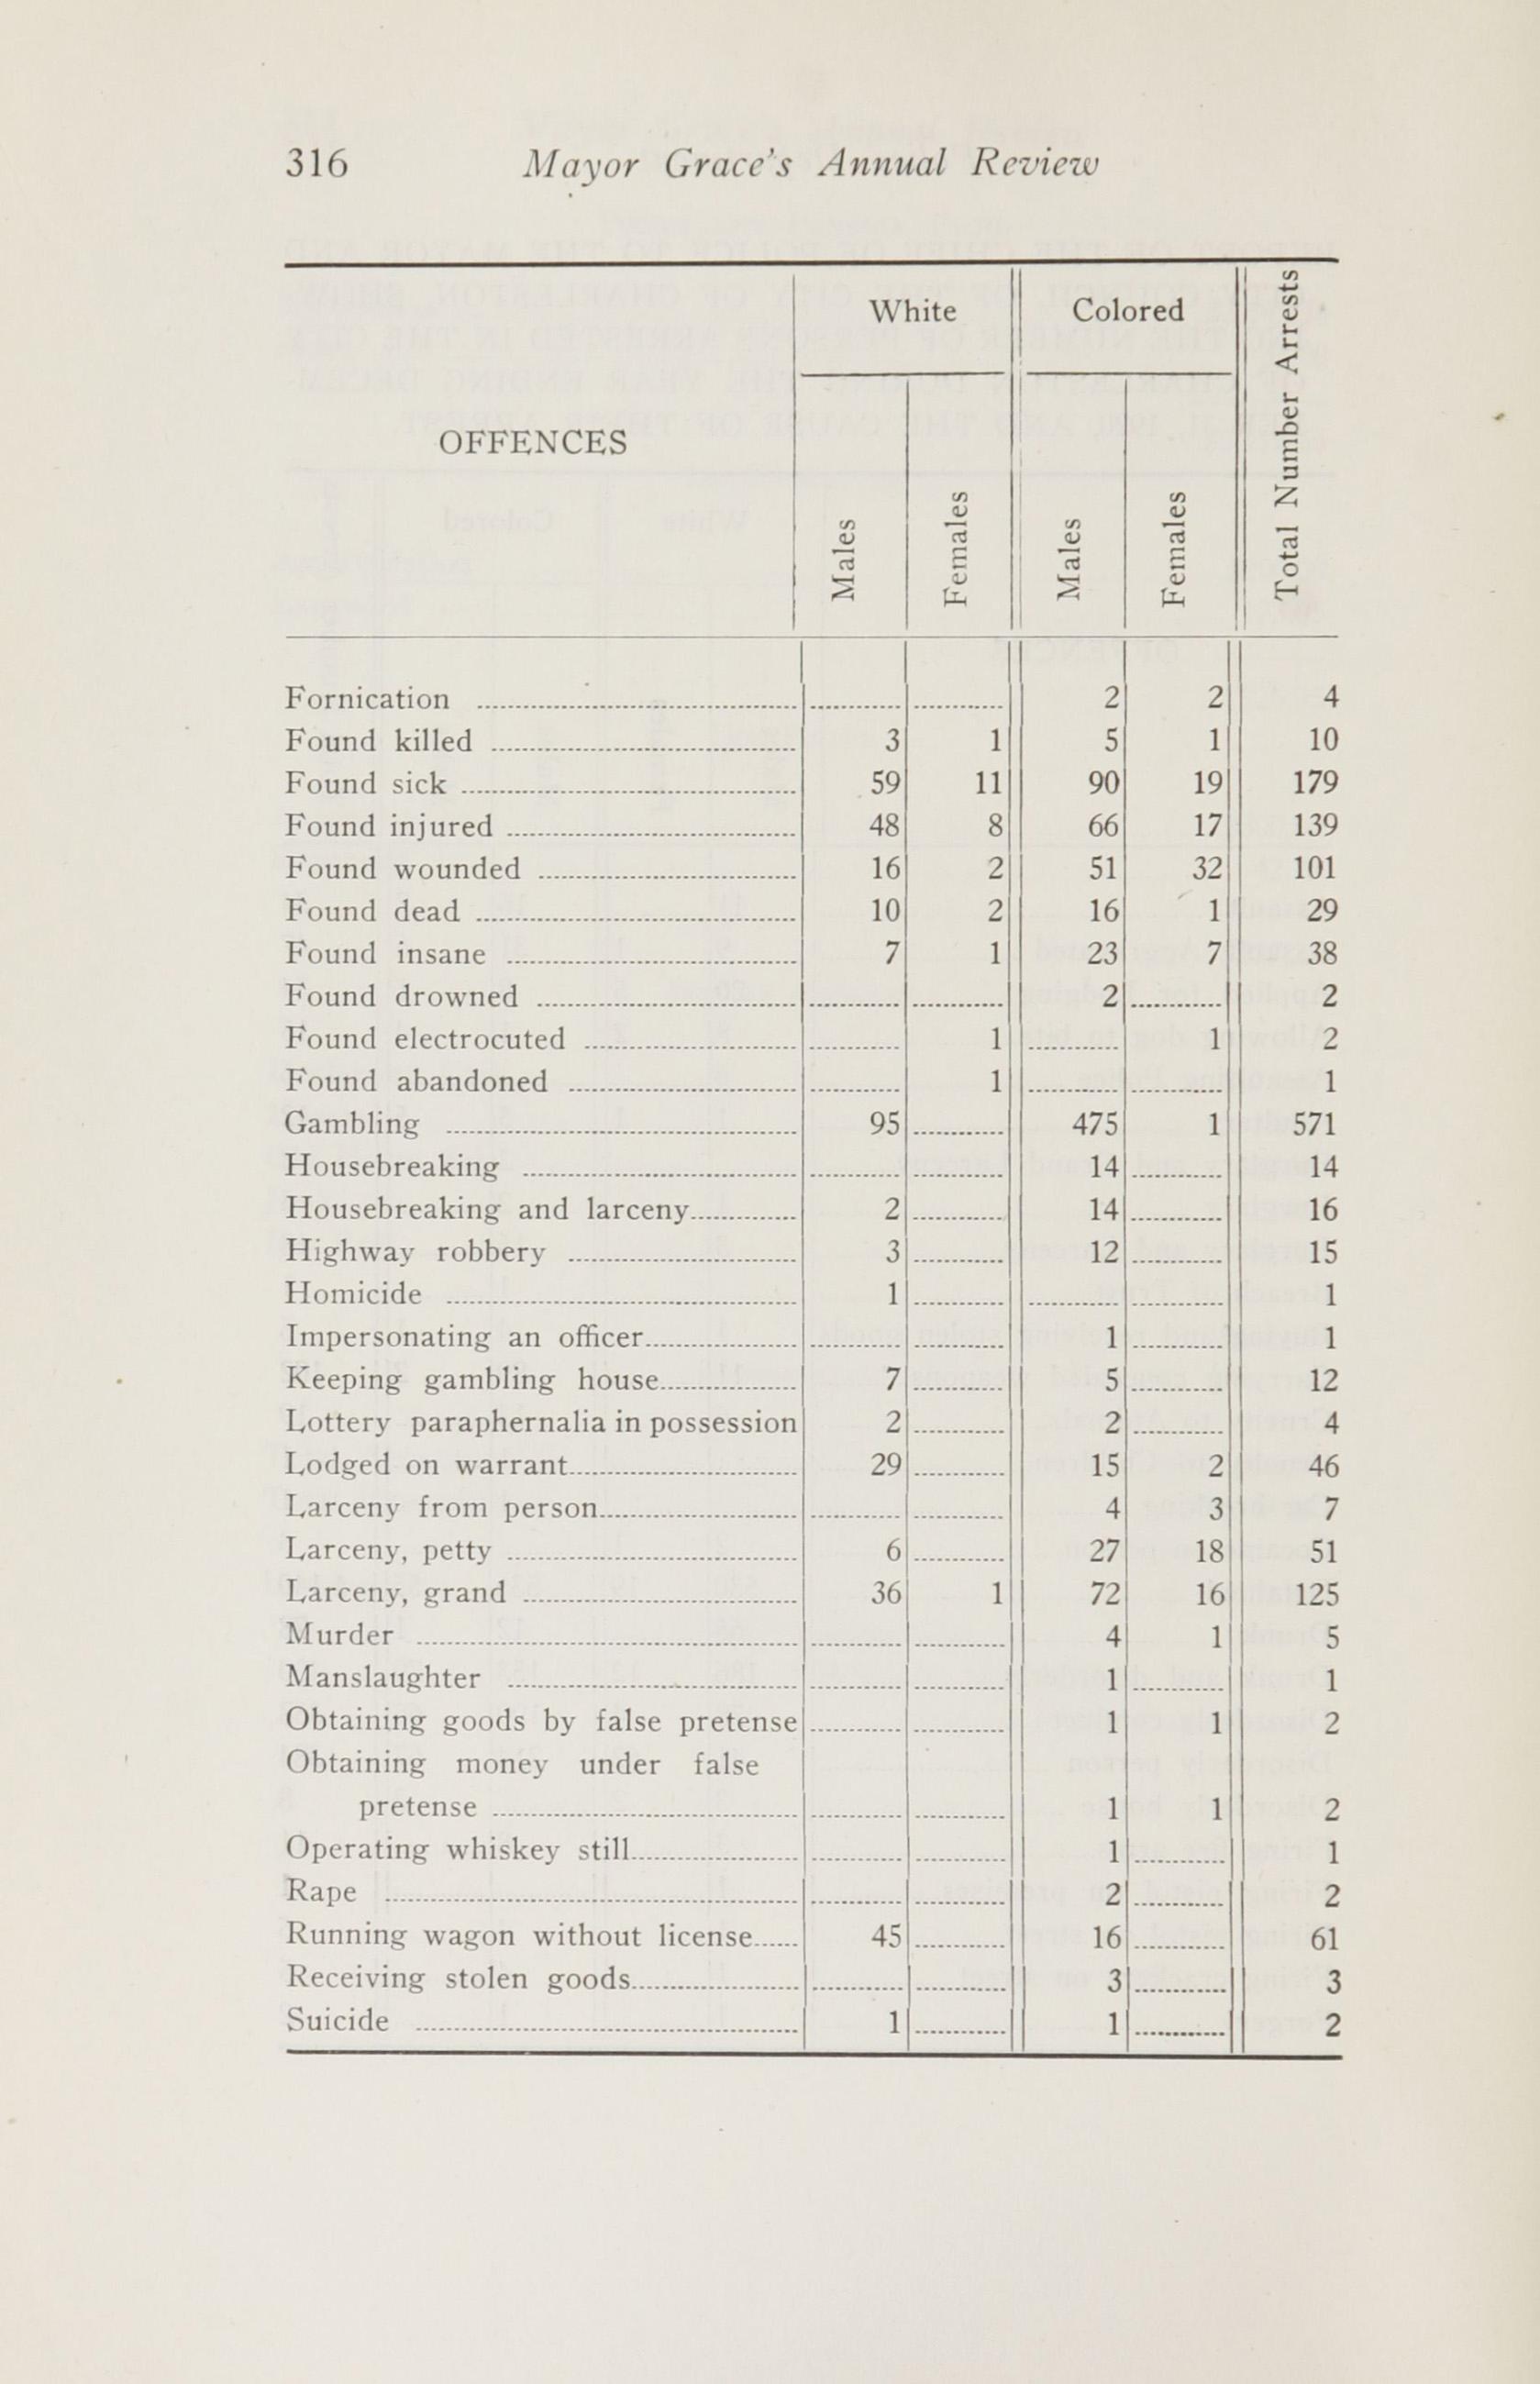 Charleston Yearbook, 1920, page 316